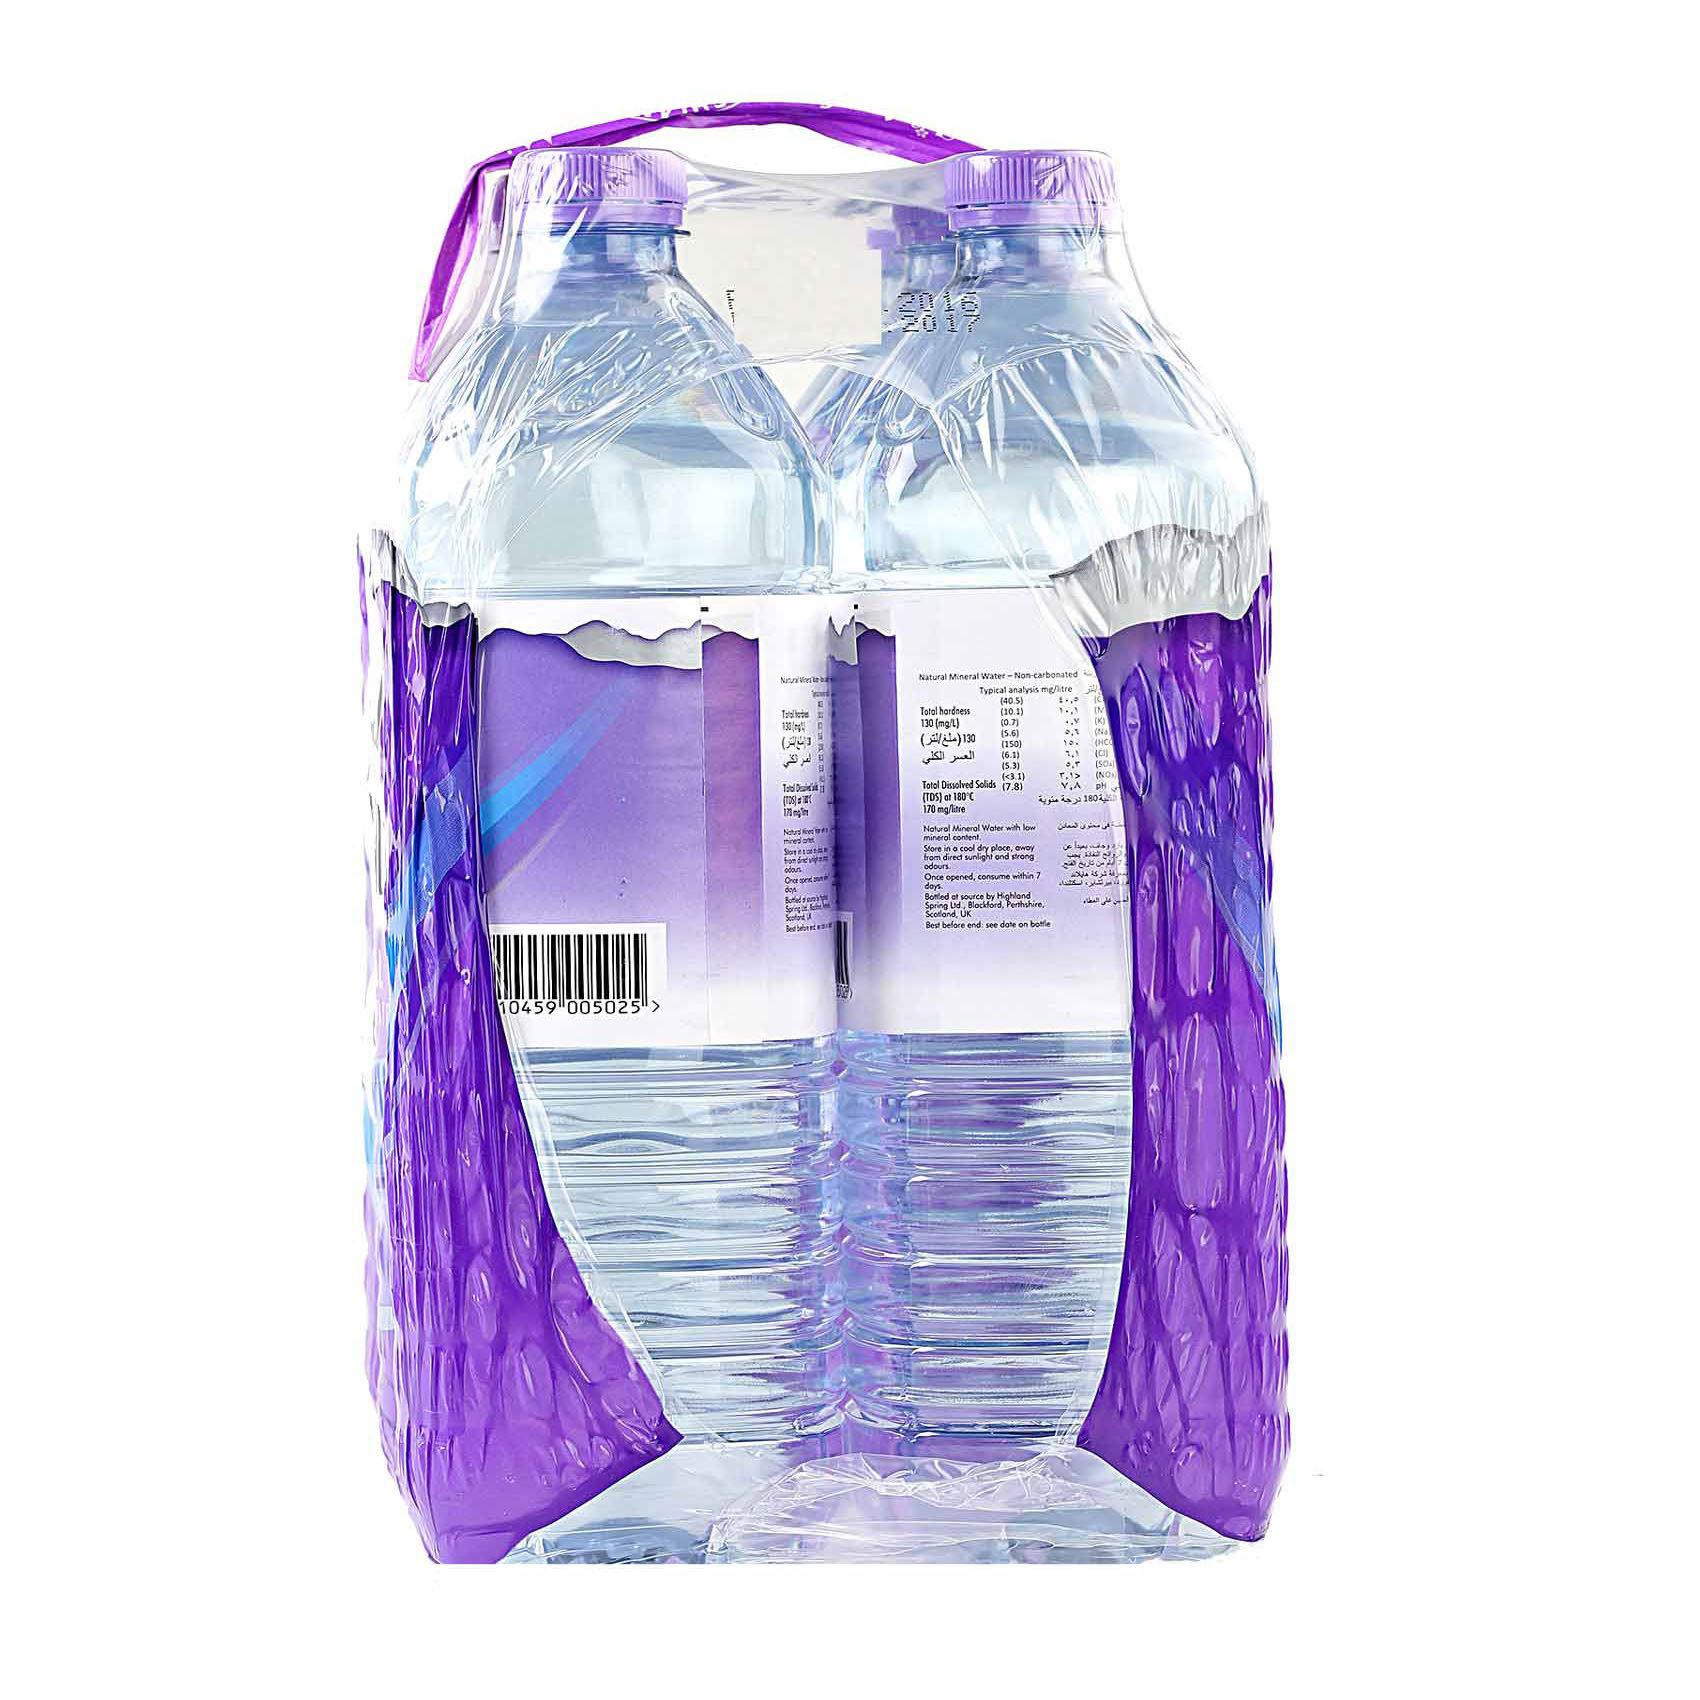 HIGHLAND SPRING WATER 1.5LX6